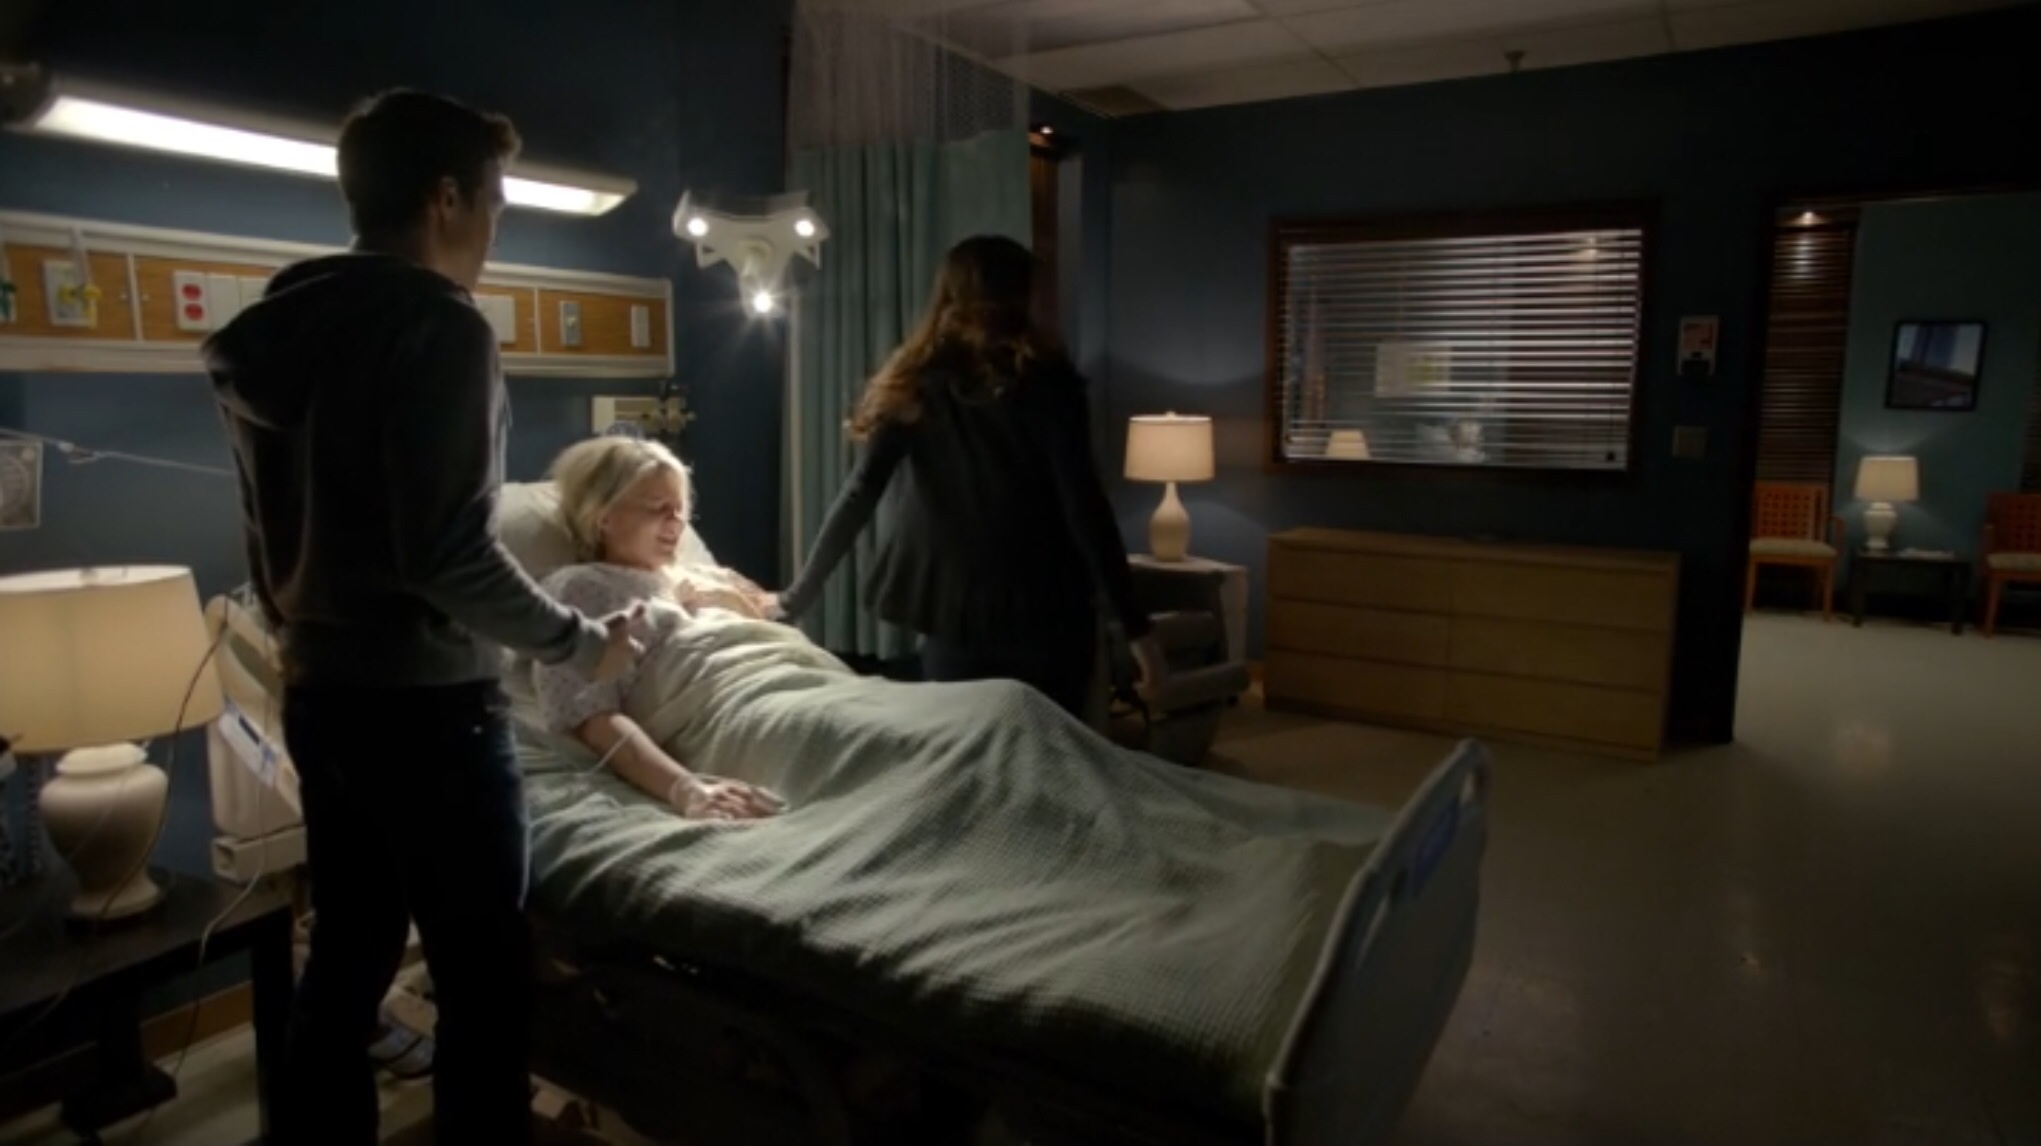 The Vampire Diaries Season 6 Episode 12 Recap: Which Twins